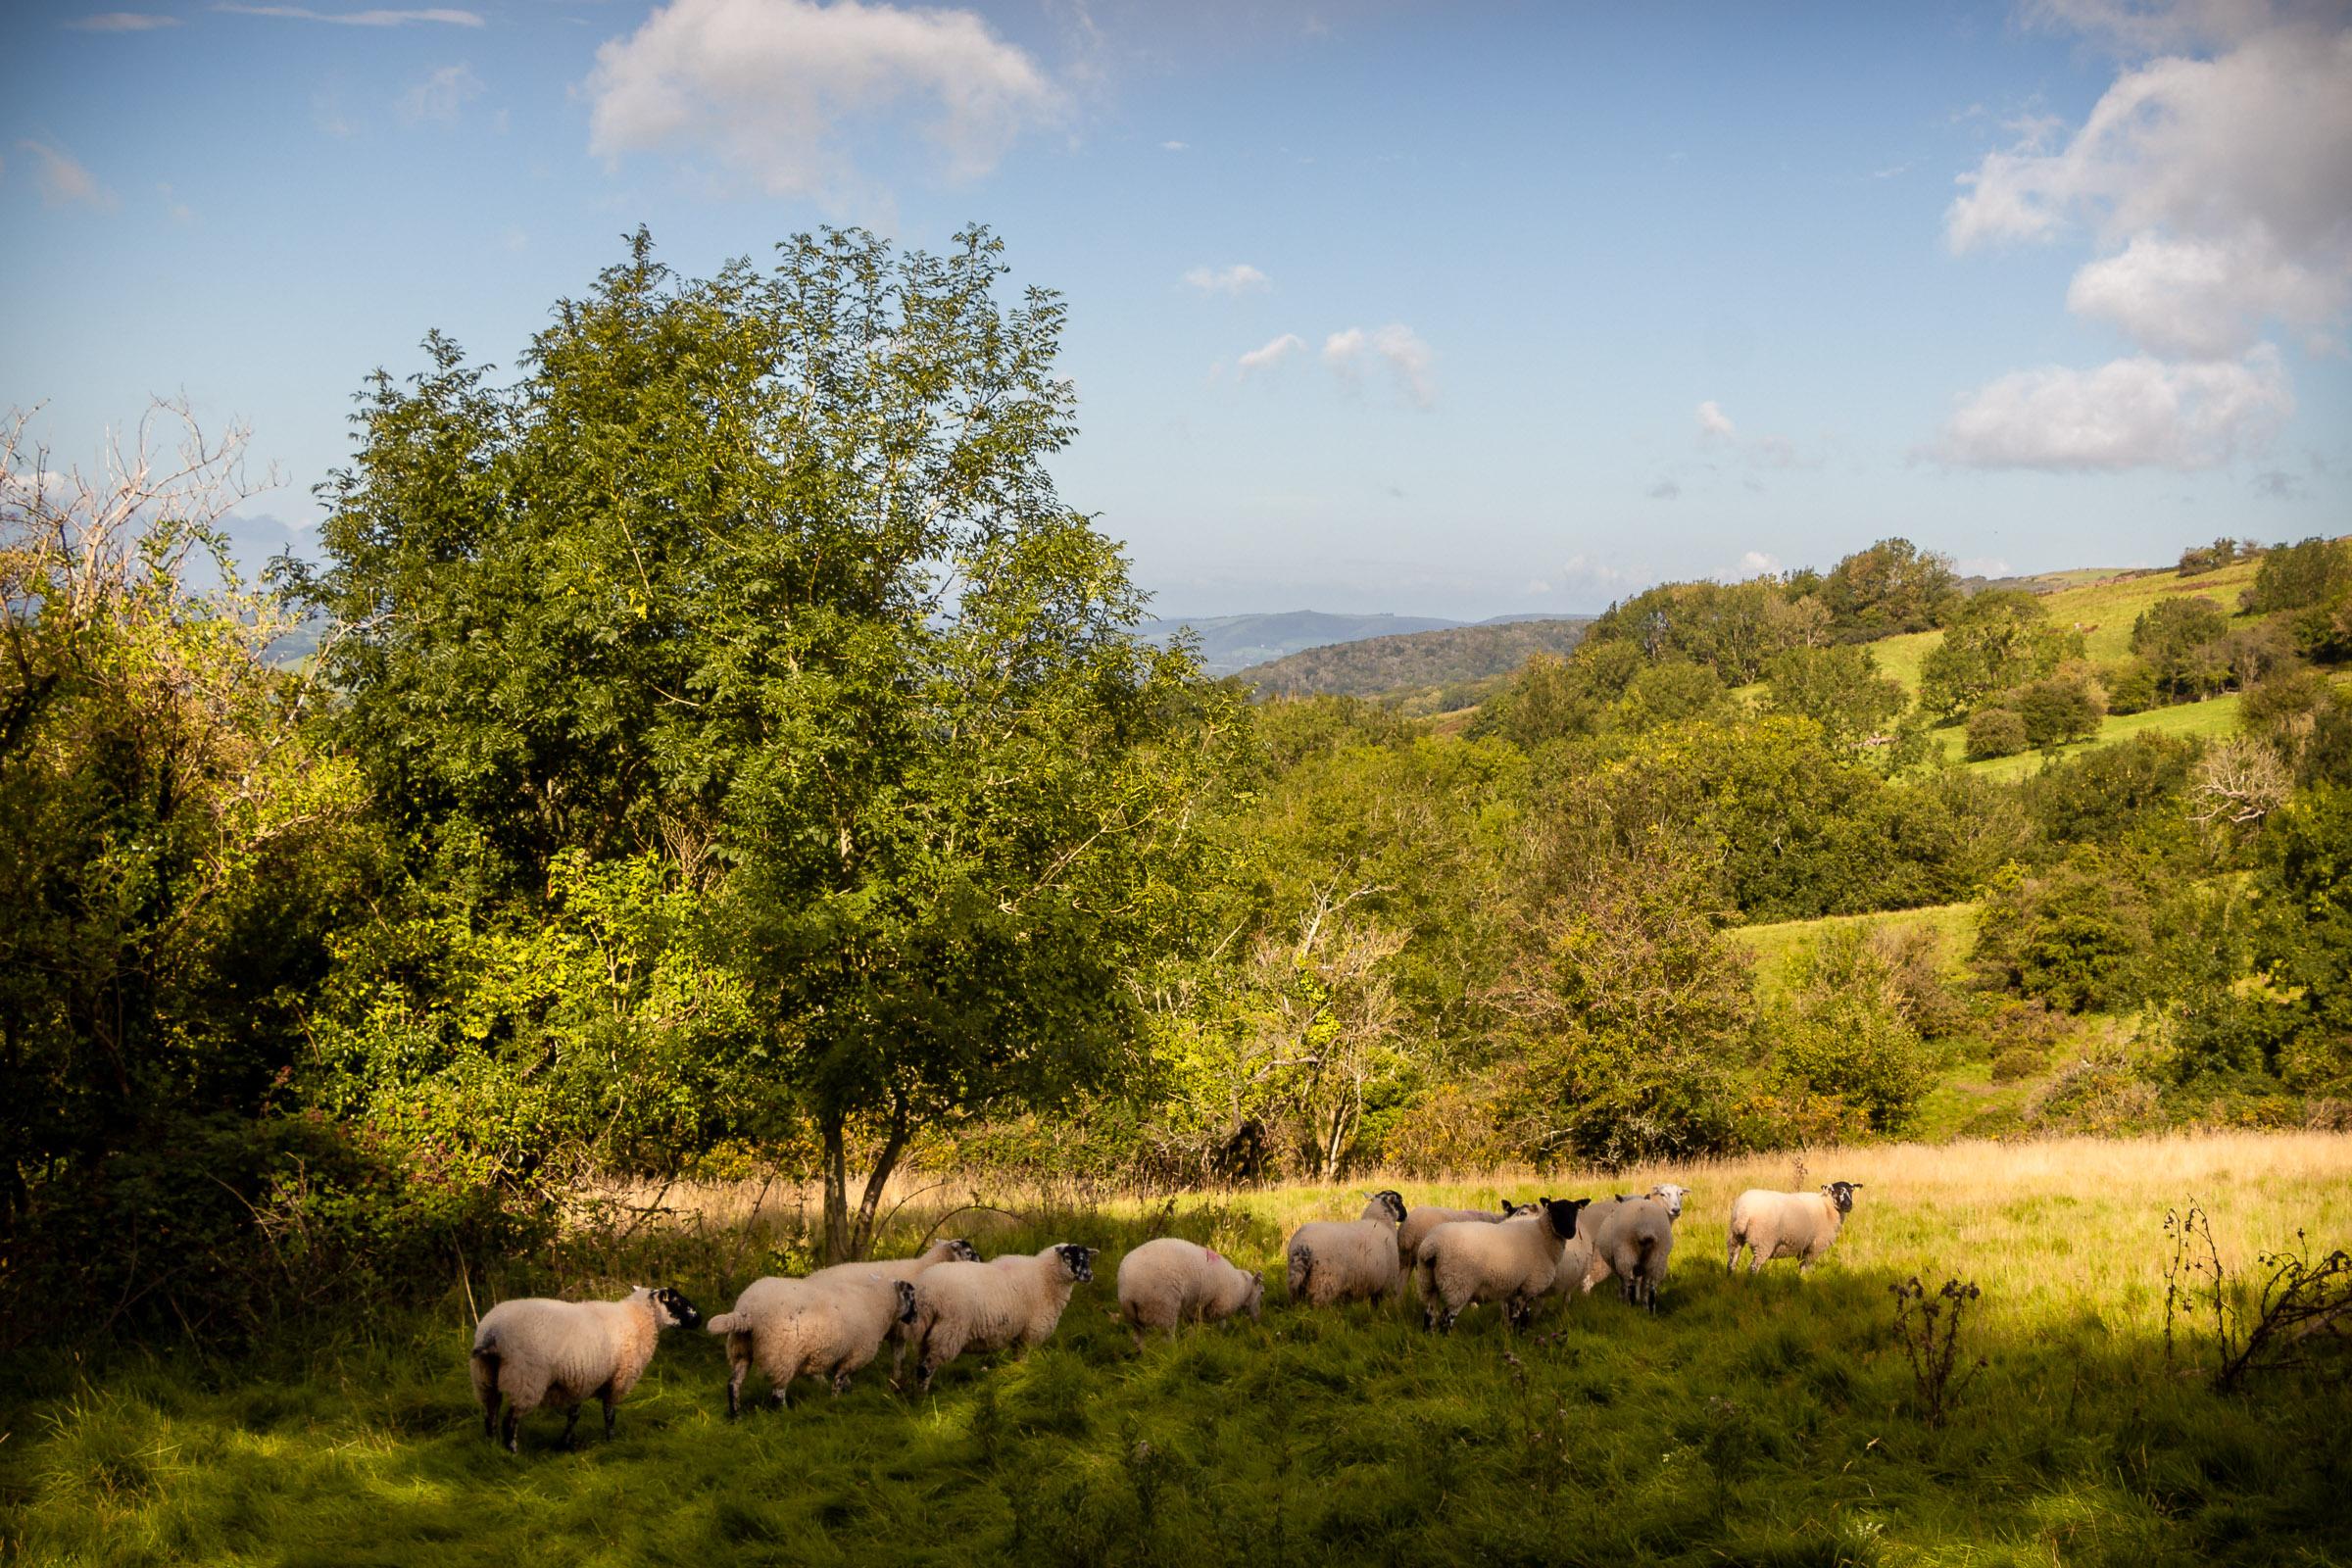 Sheep follow their leader - Deerleap, Somerset, UK. ID IMG_7372